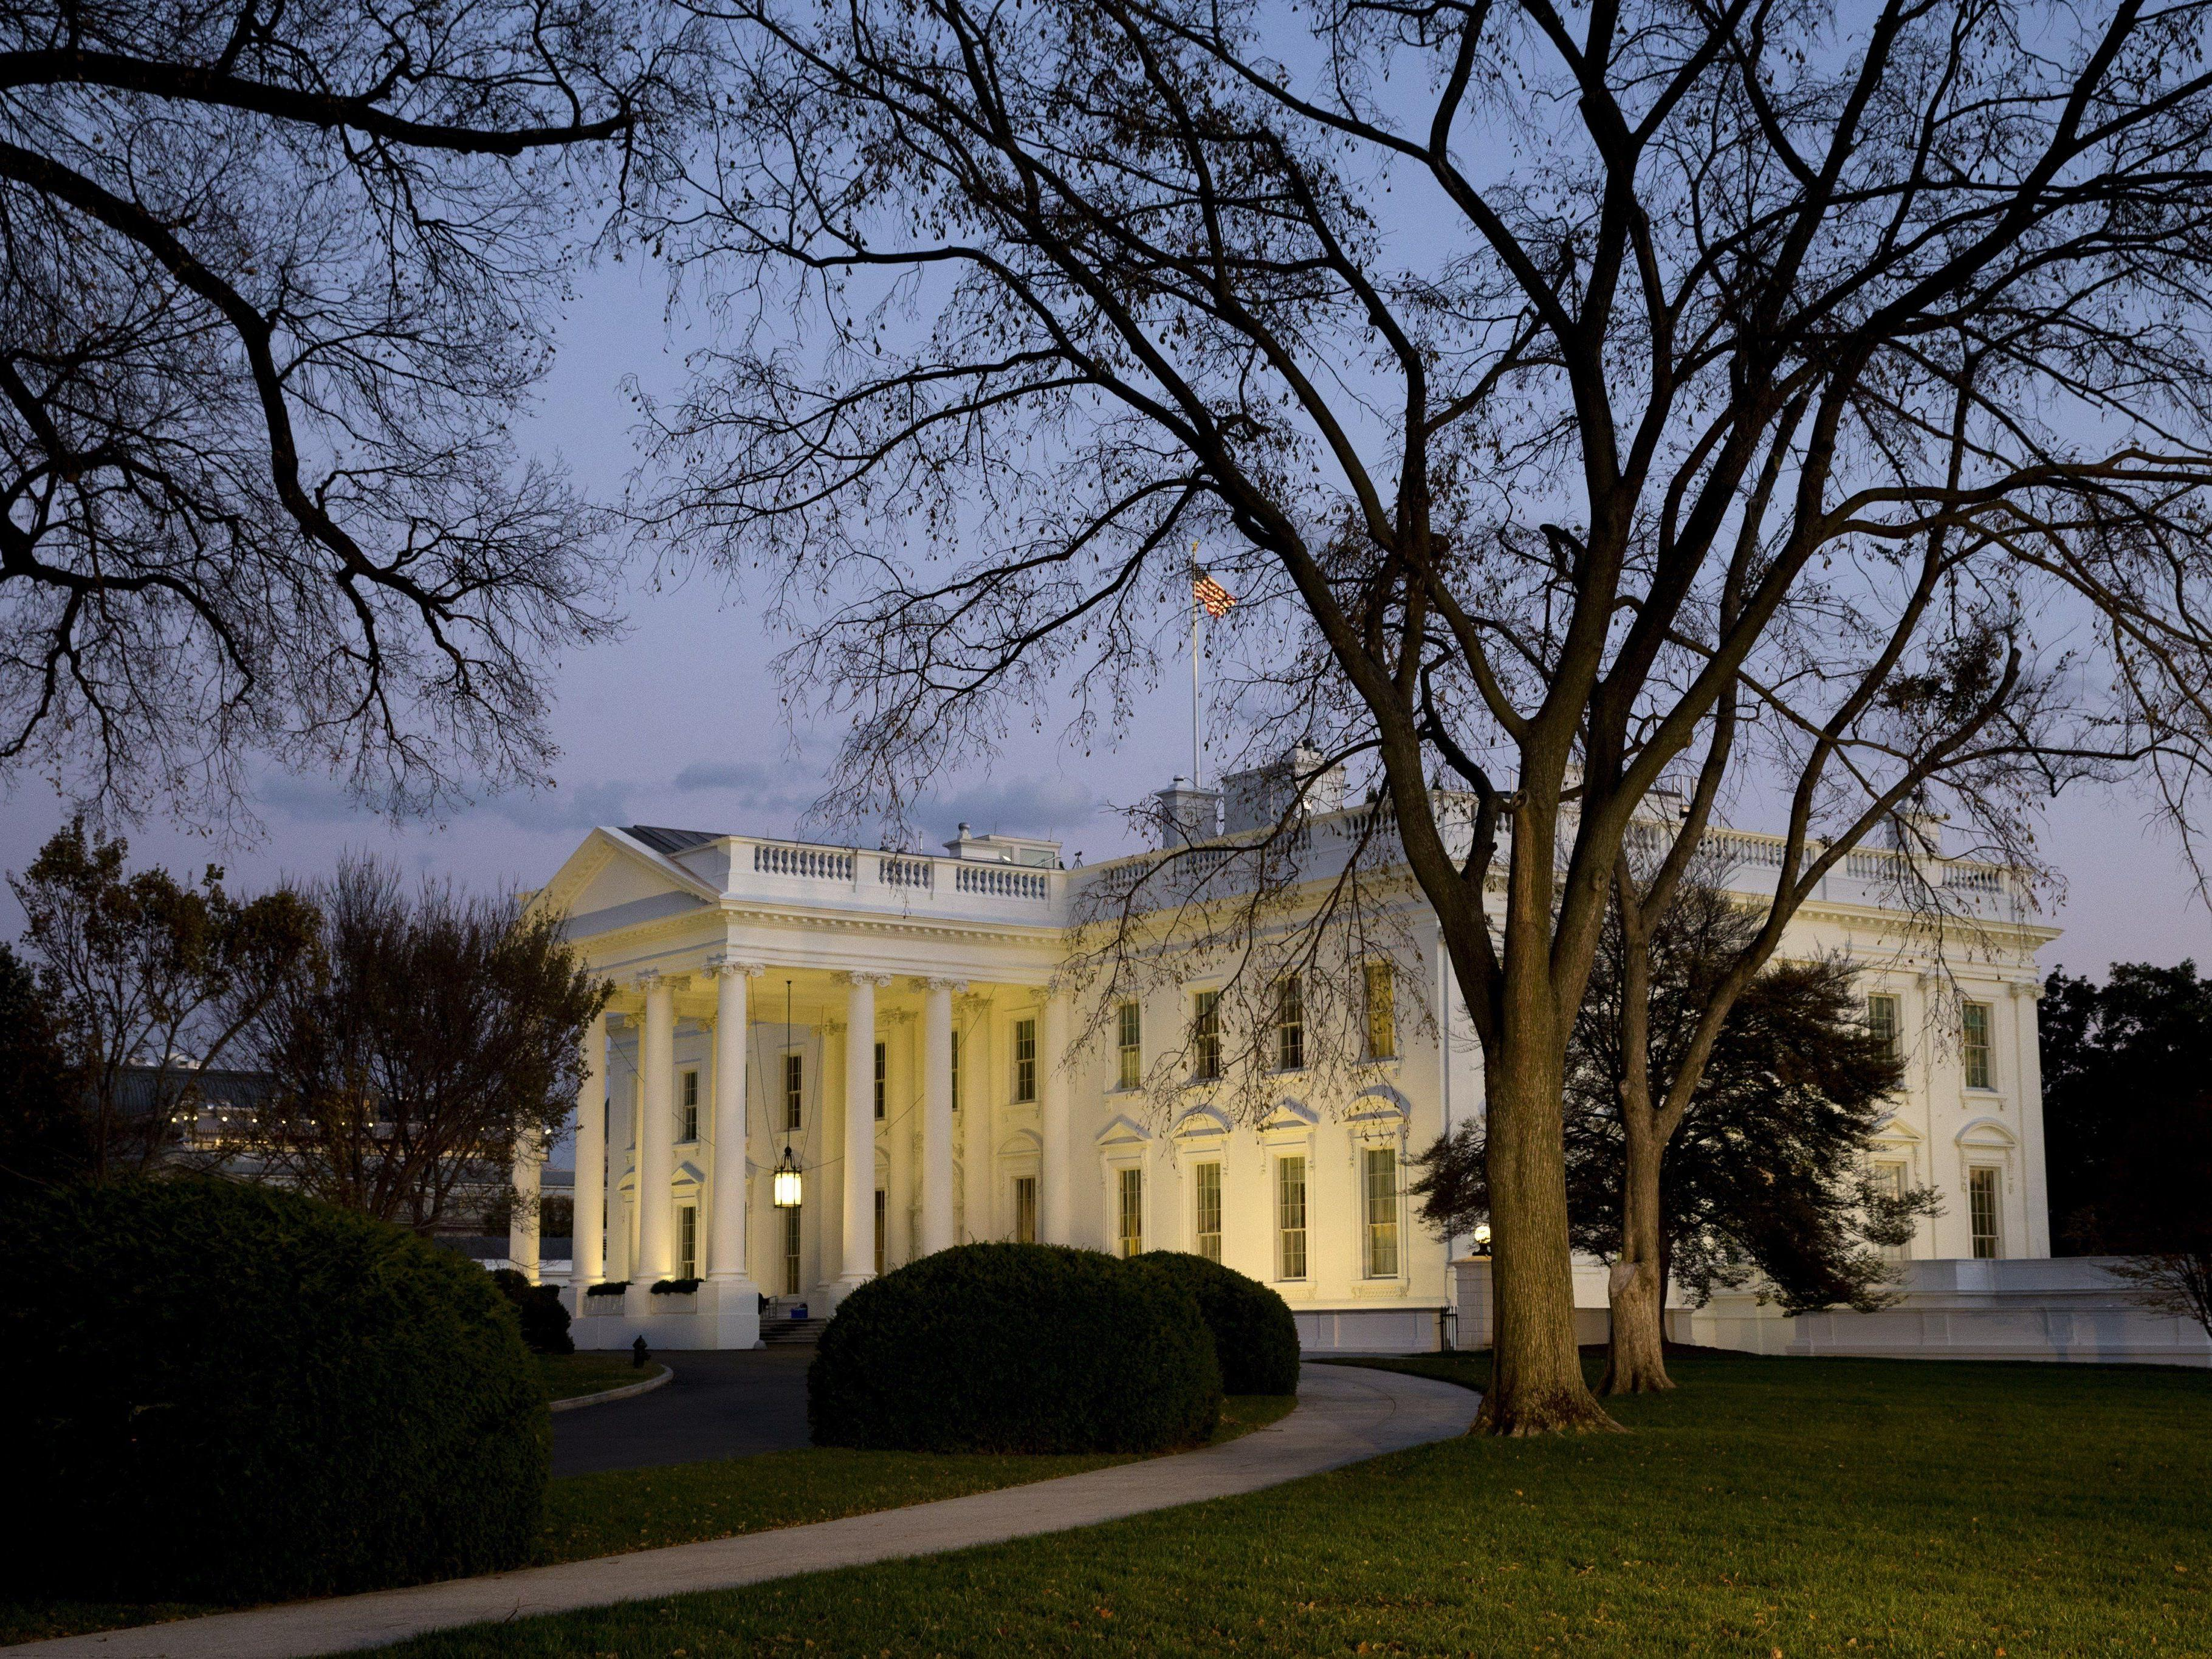 Nächste US-Präsidentenwahl findet Ende 2016 statt.